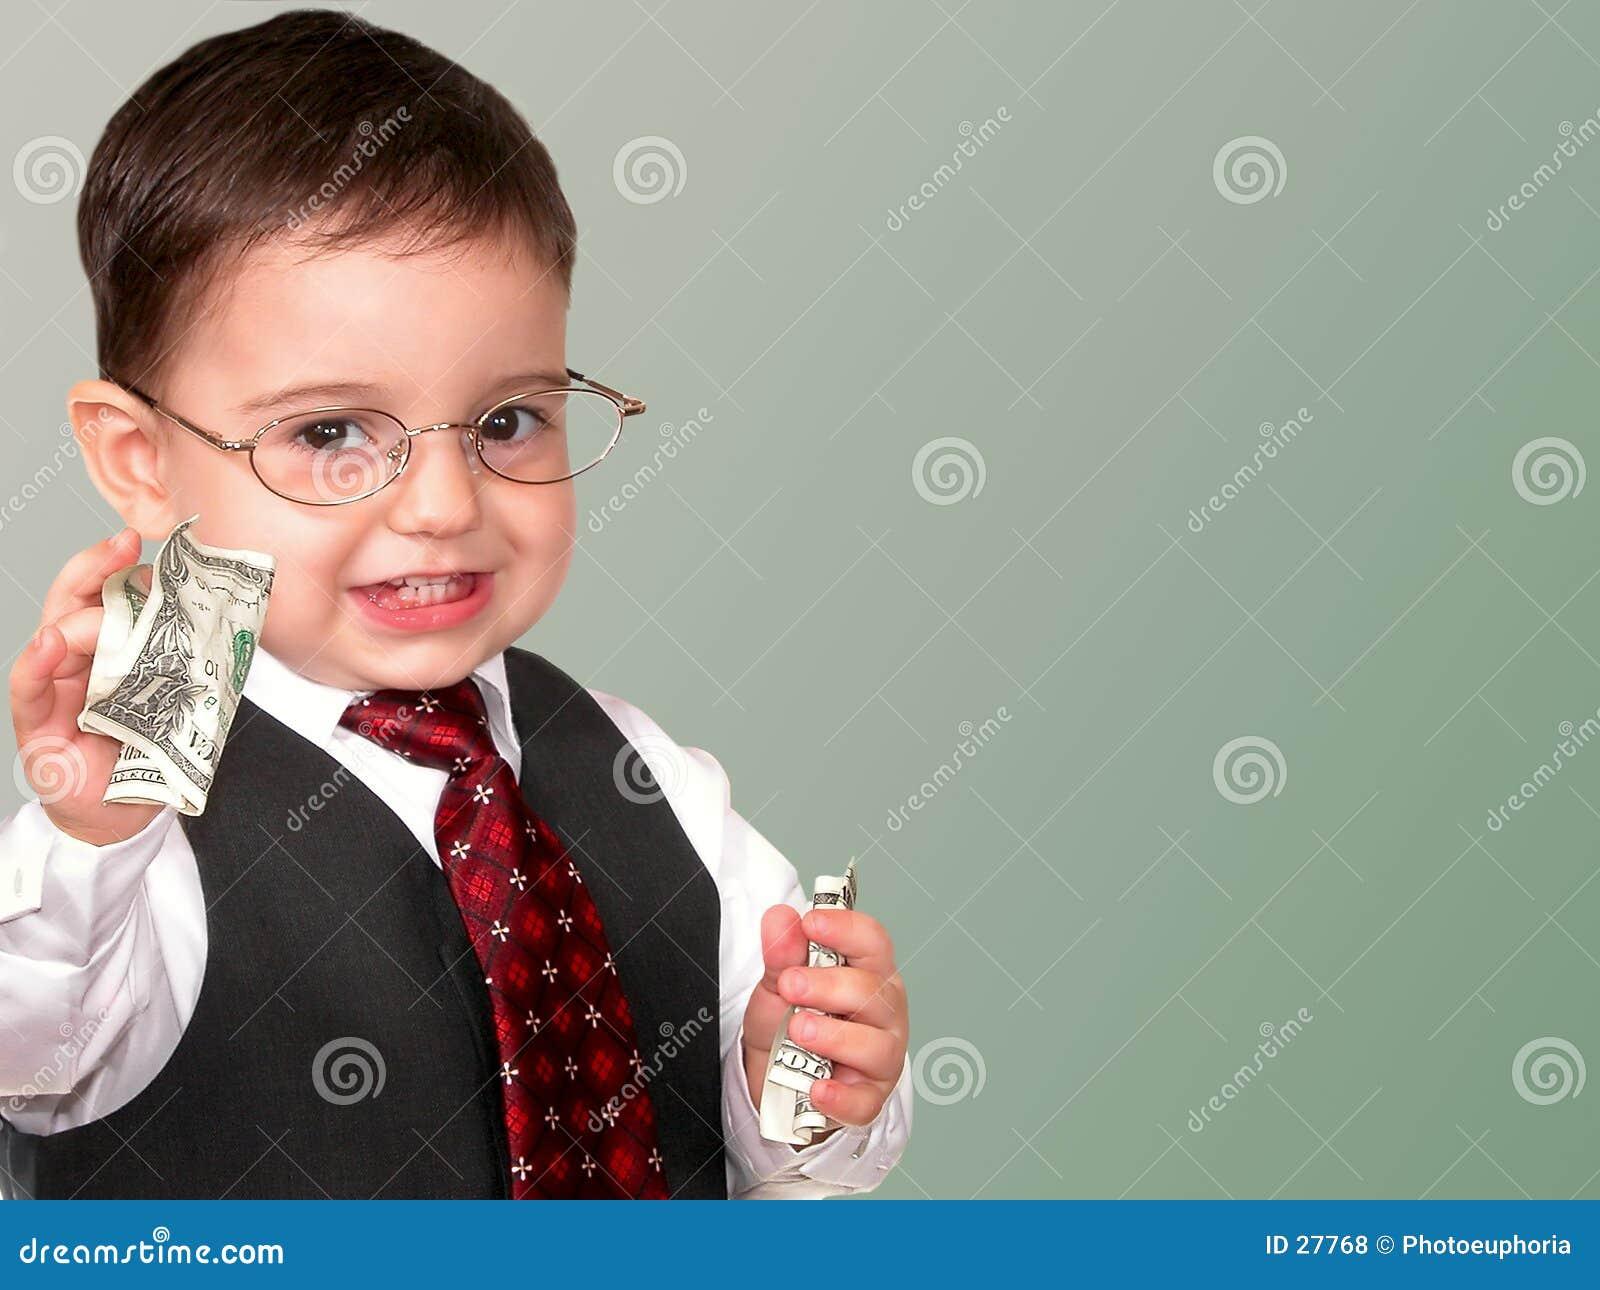 Little Man Series: Mr. Money Bags